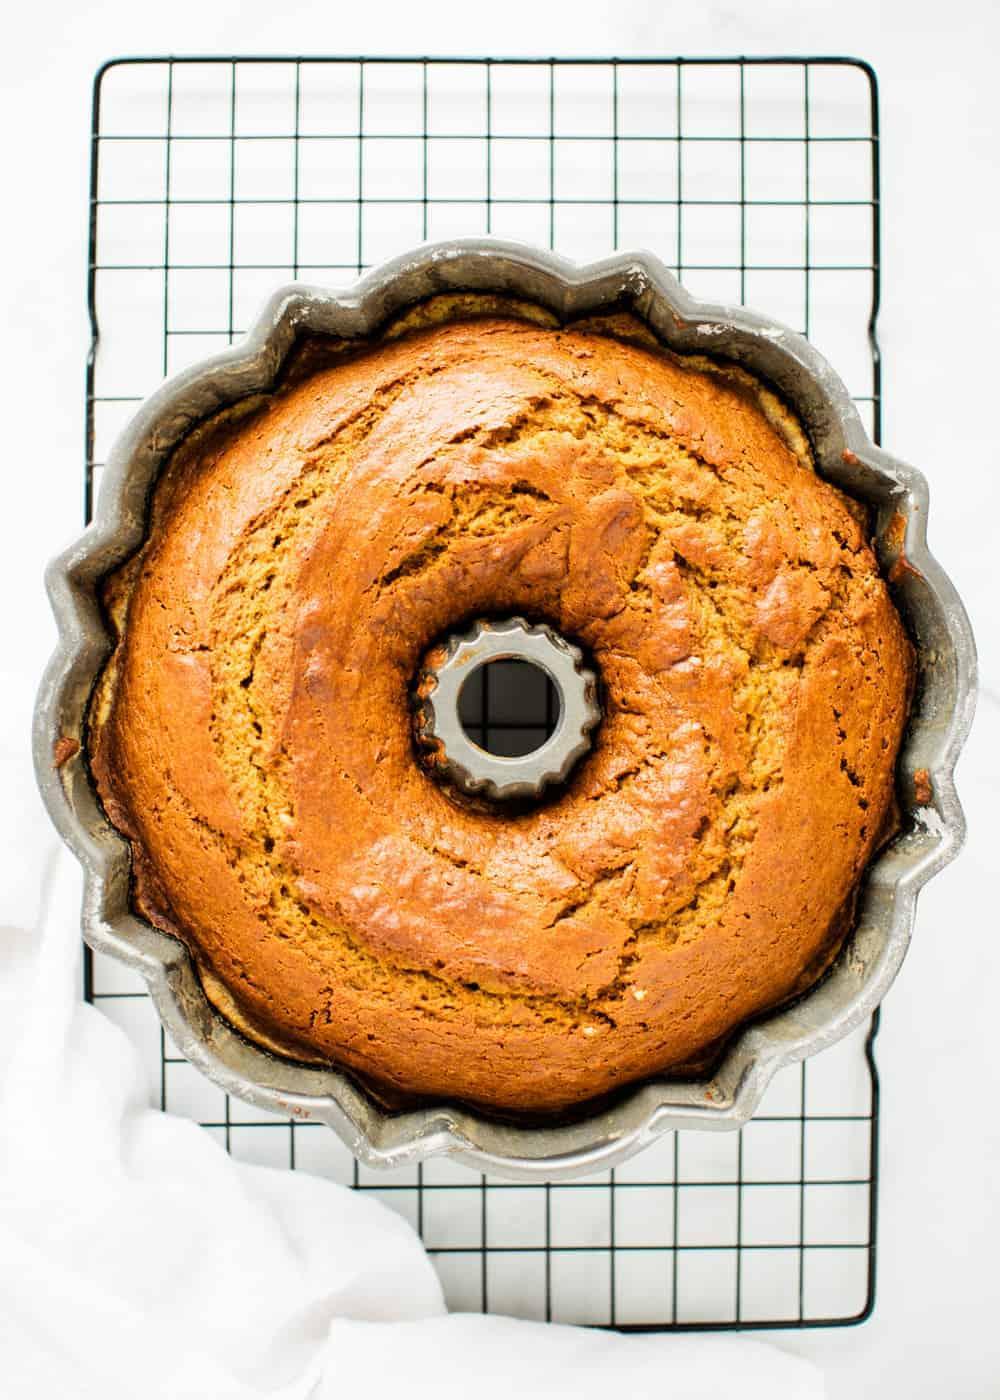 cooked pumpkin bundt cake in pan sitting on a baking rack